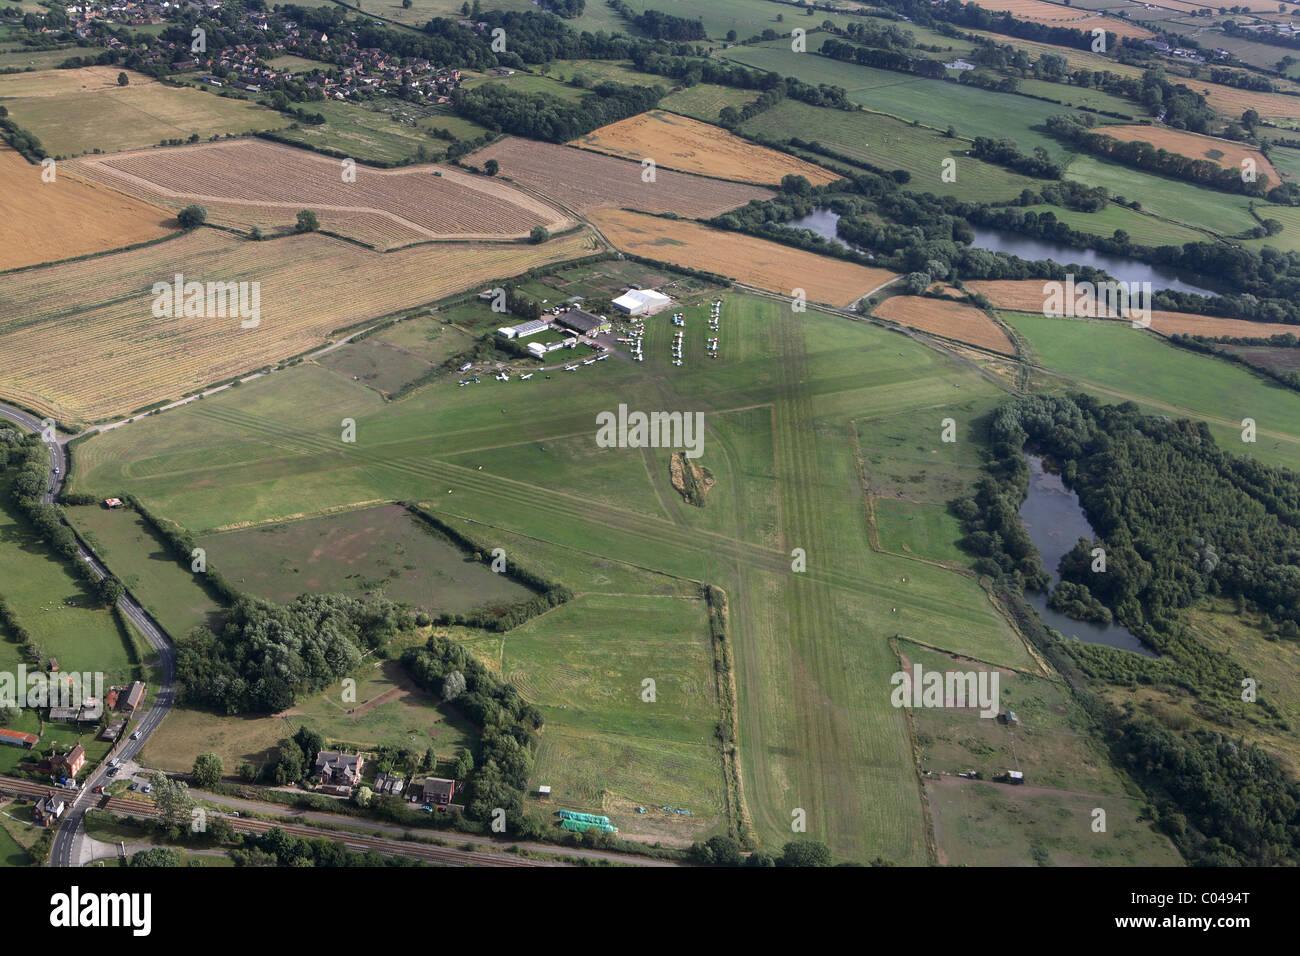 Derby flying club near to Hatton Derbyshire UK - Stock Image